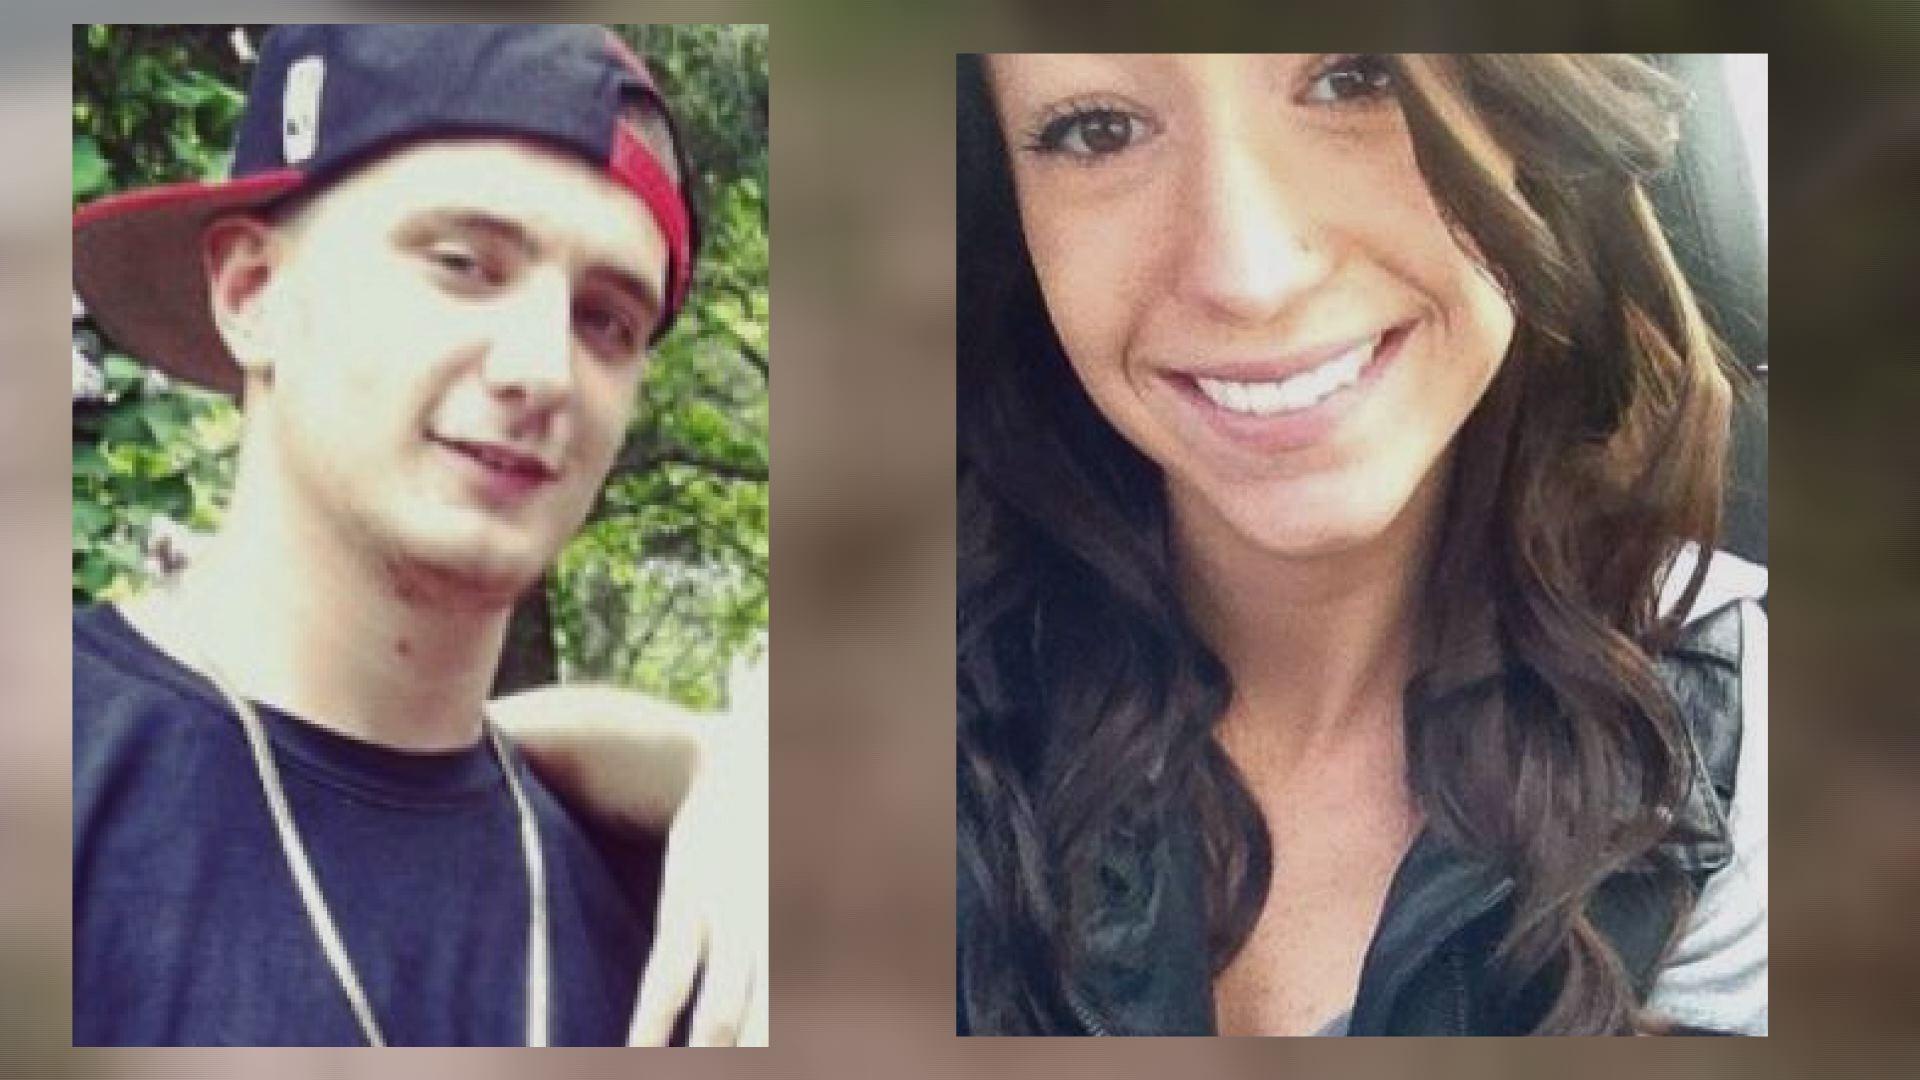 Matthew Szyndlar, 19, and Kerri Rogoz, 20, died in a motorcycle crash in Waterbury early Monday.